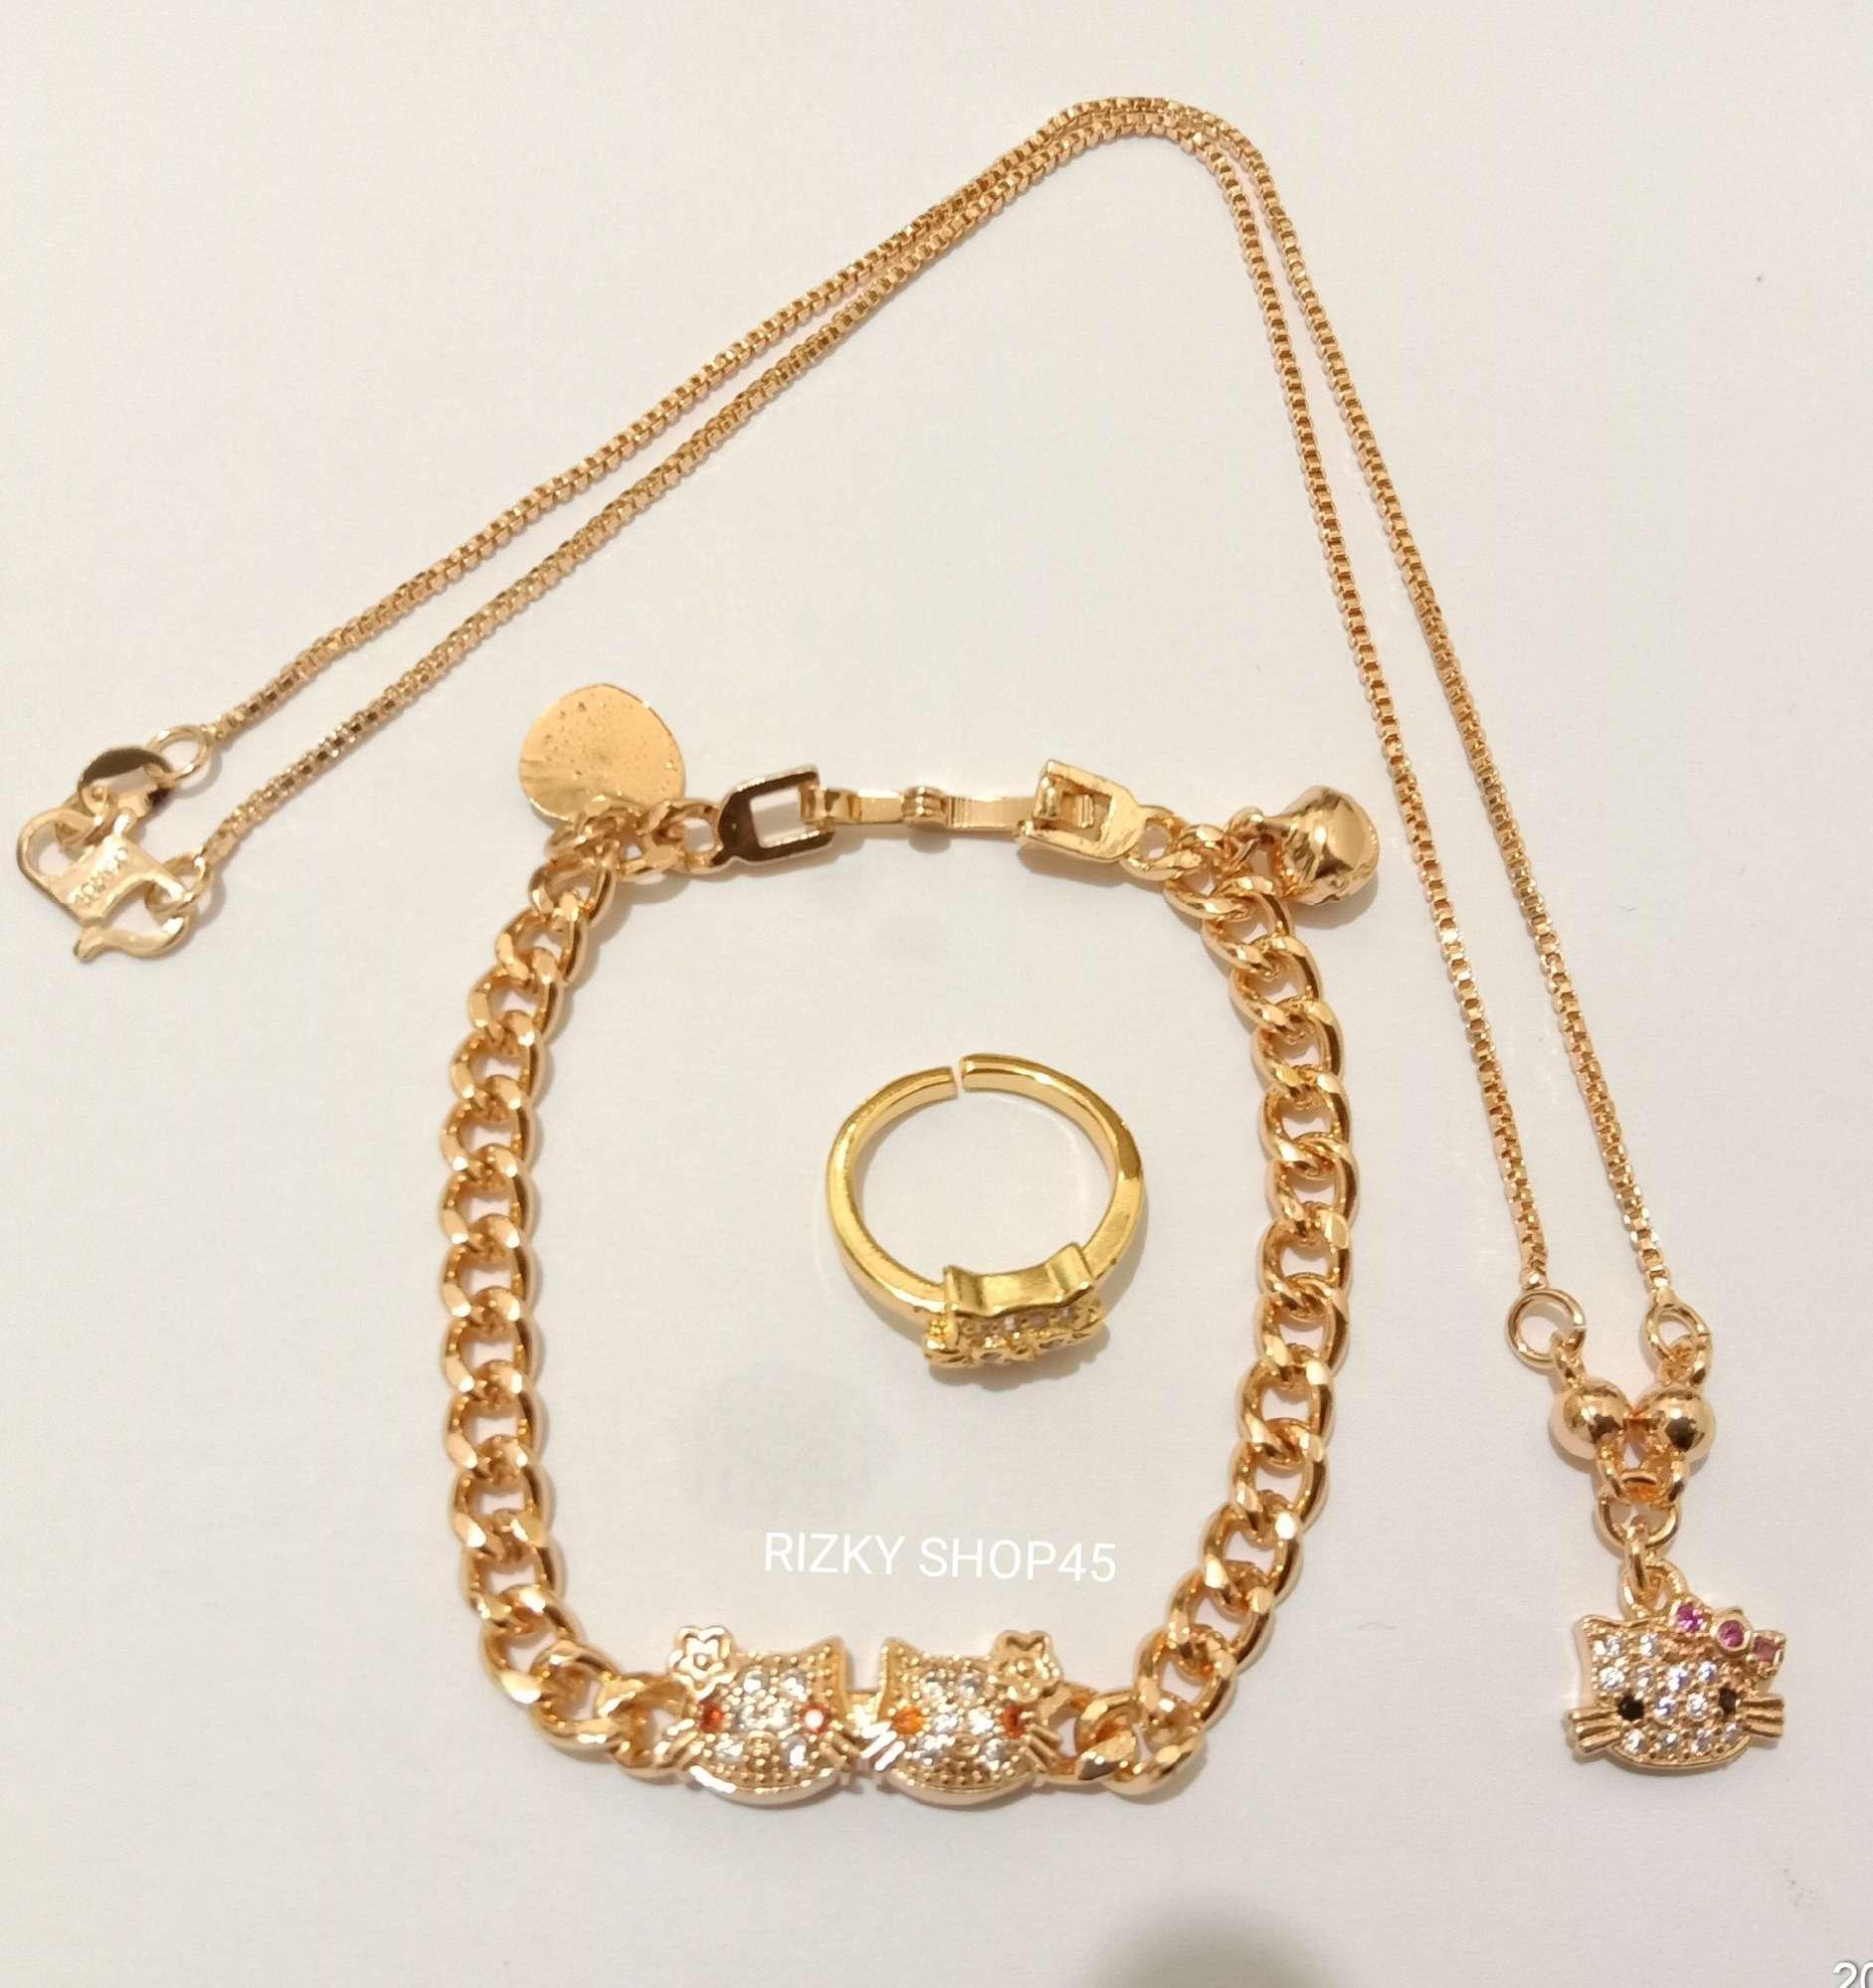 SET kalung gelang anak cincin xuping motif kitty mata gold